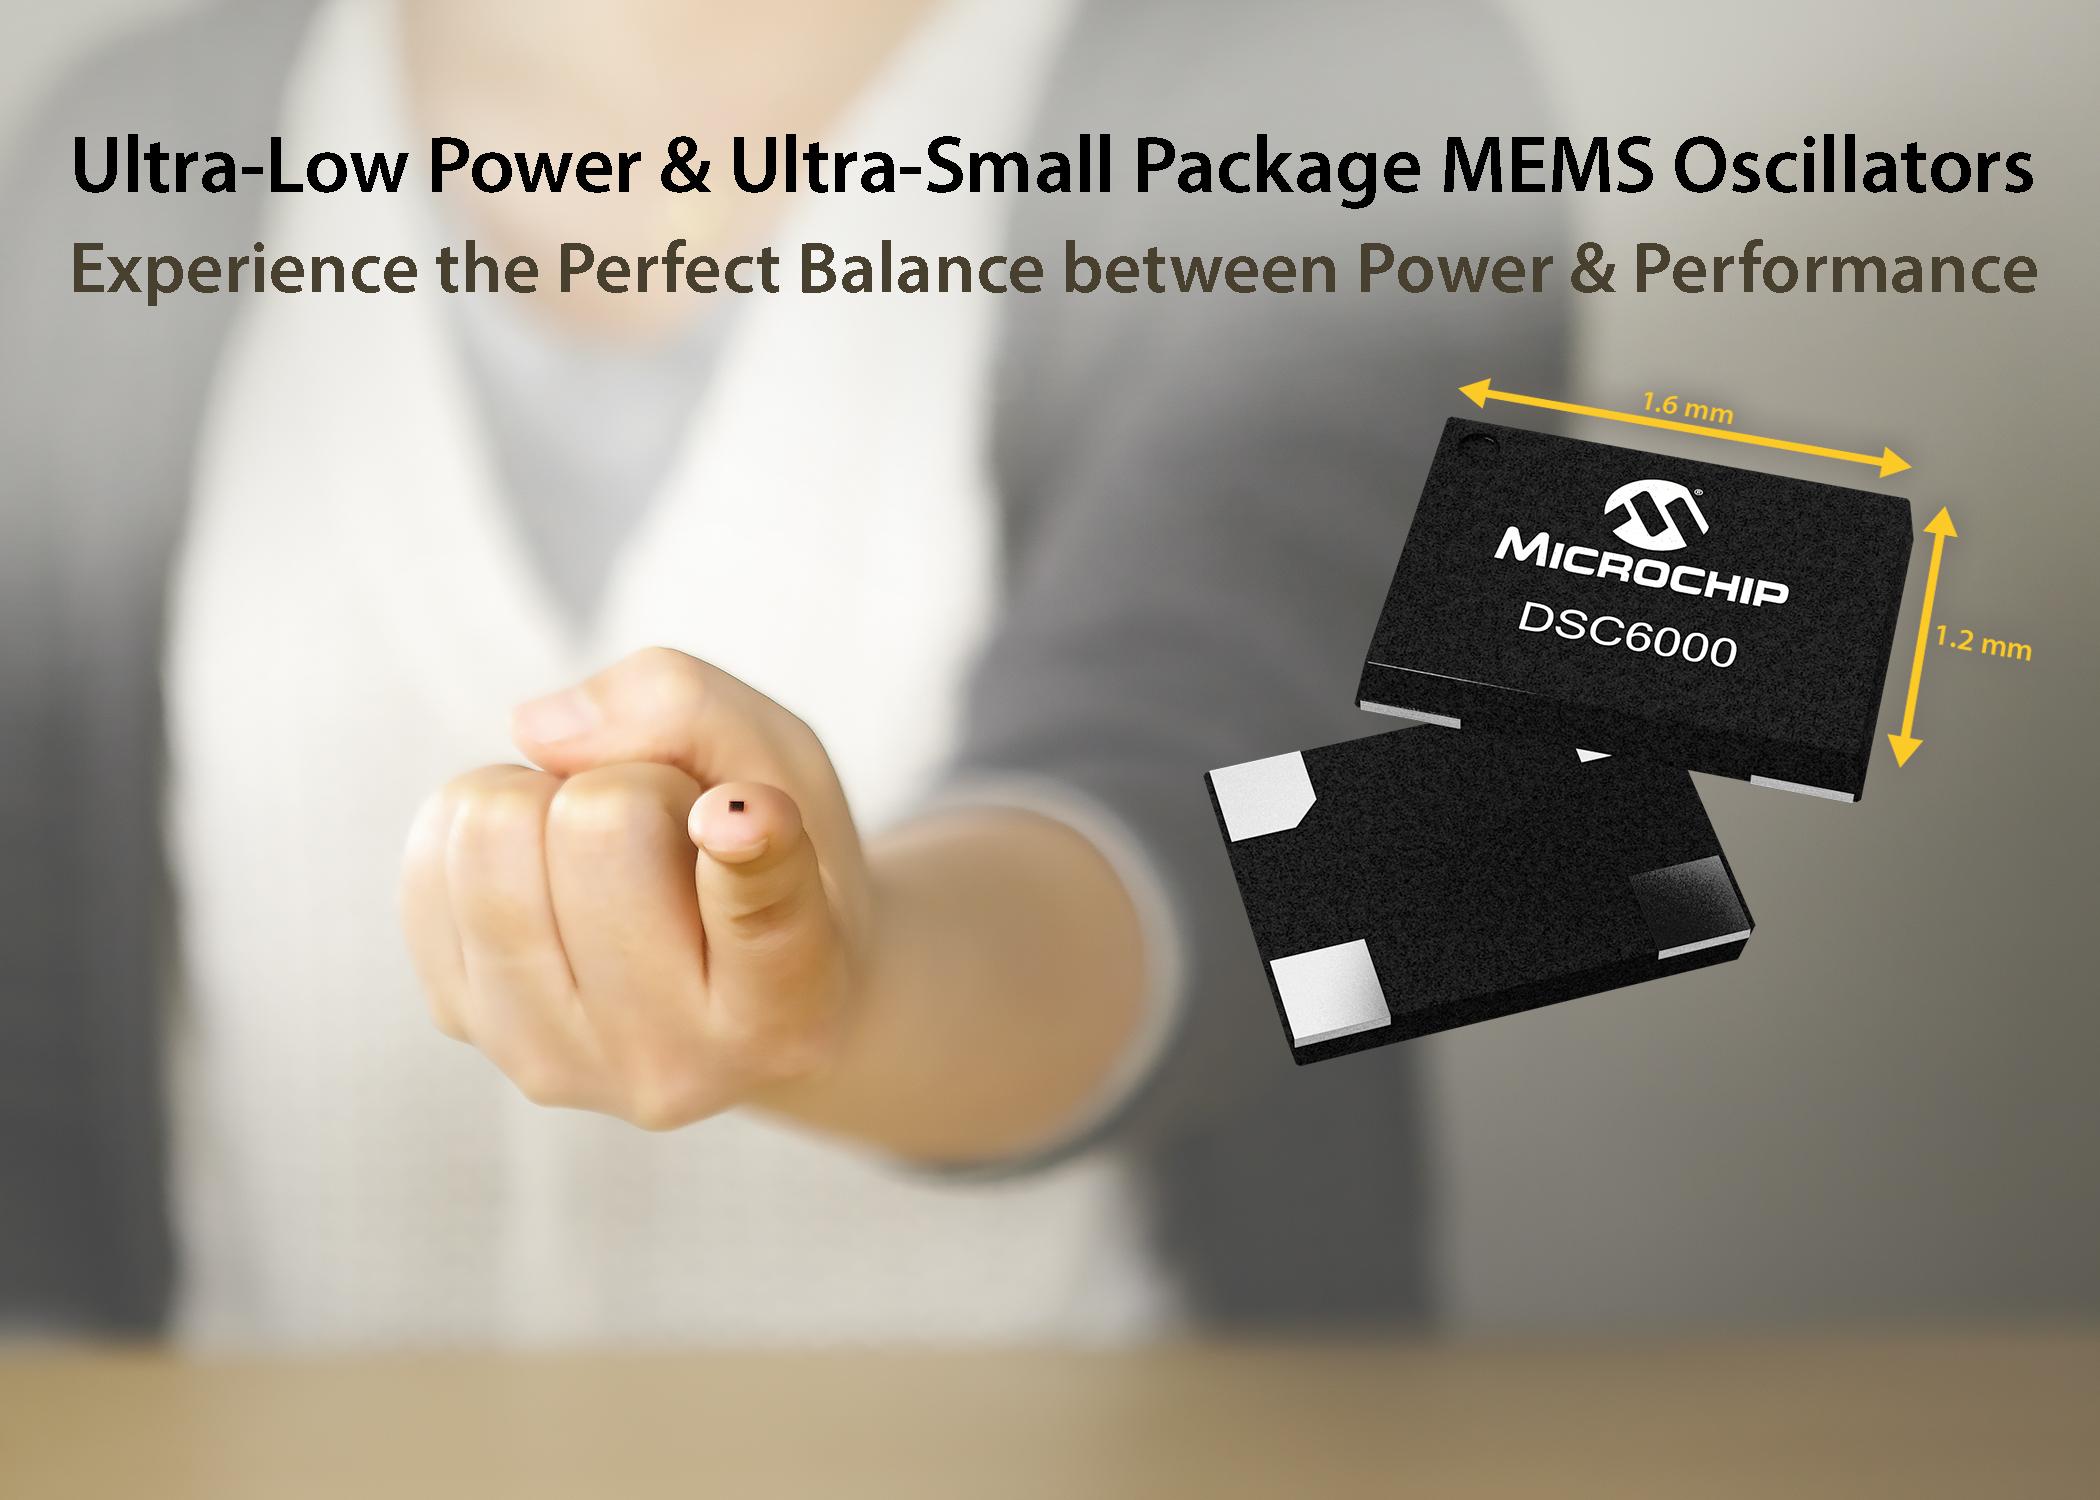 Microchip 推出业内集最小型封装和超低功耗技术为一体的DSC6000系列MEMS振荡器